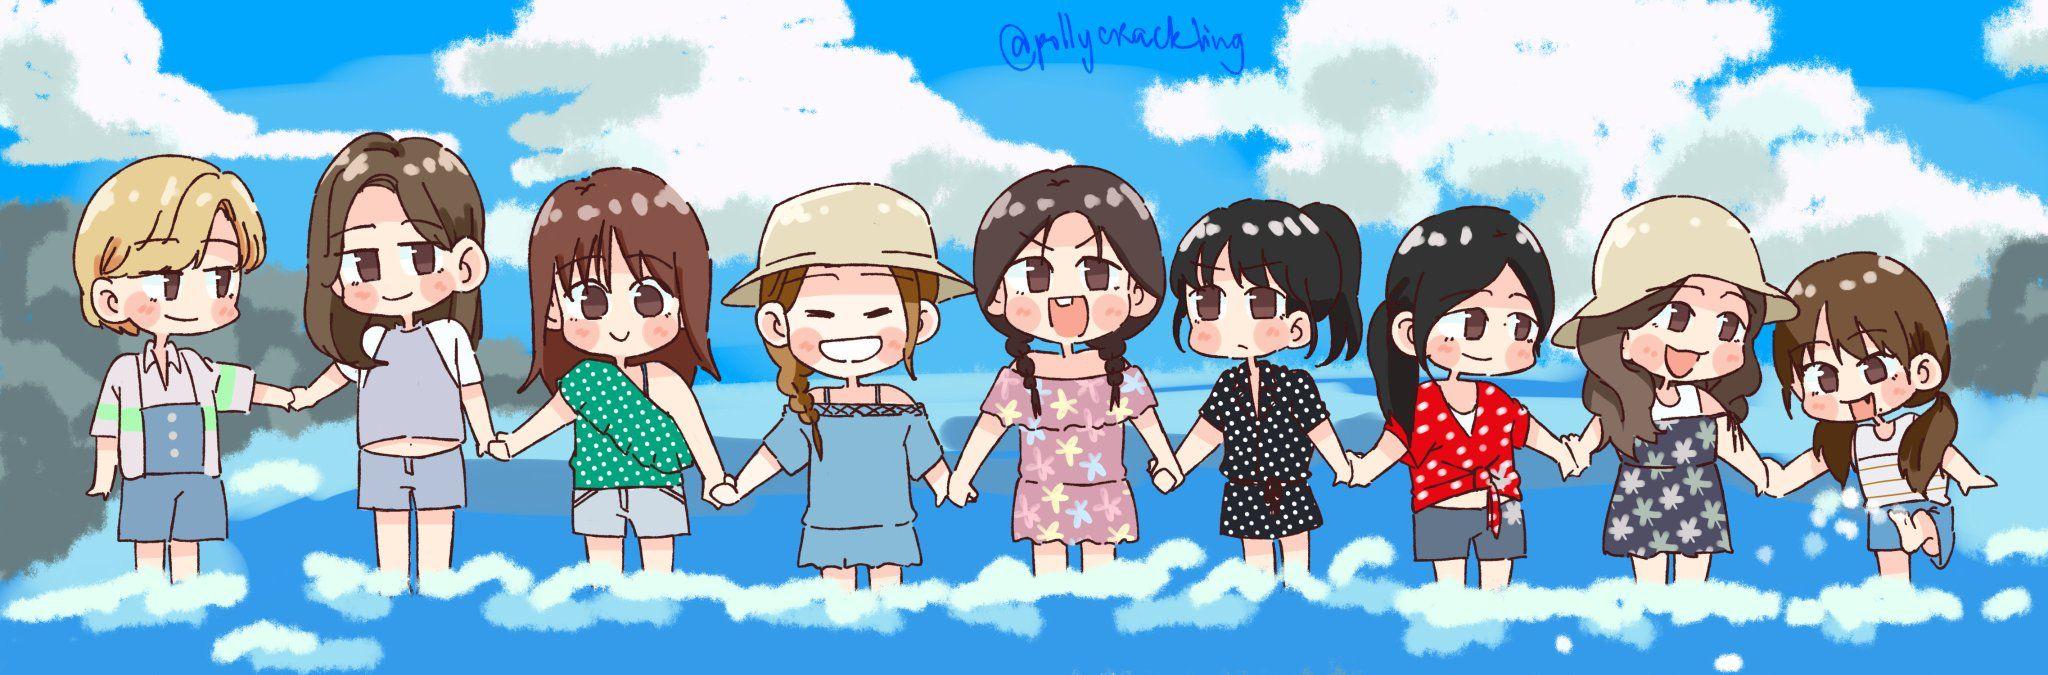 Ghim của Kaka Đào trên Twice Anime, Tuổi trẻ